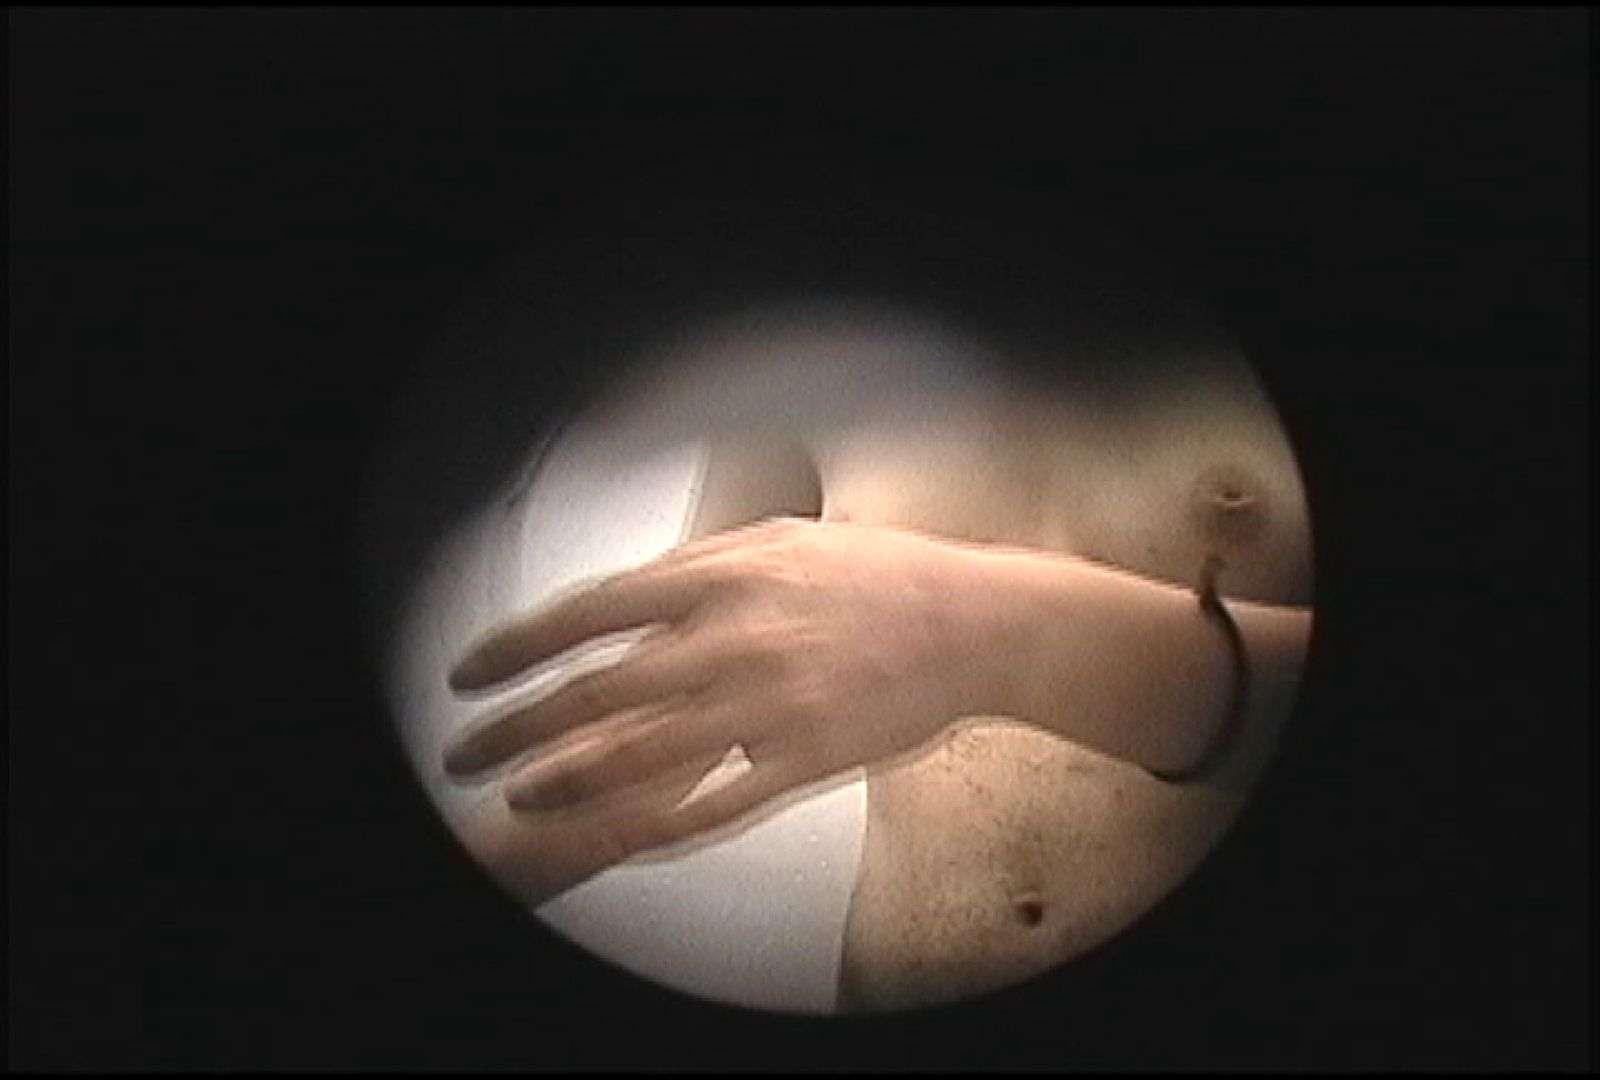 No.126 砂まみれ陥没乳首 細身・スレンダー エロ画像 71画像 37